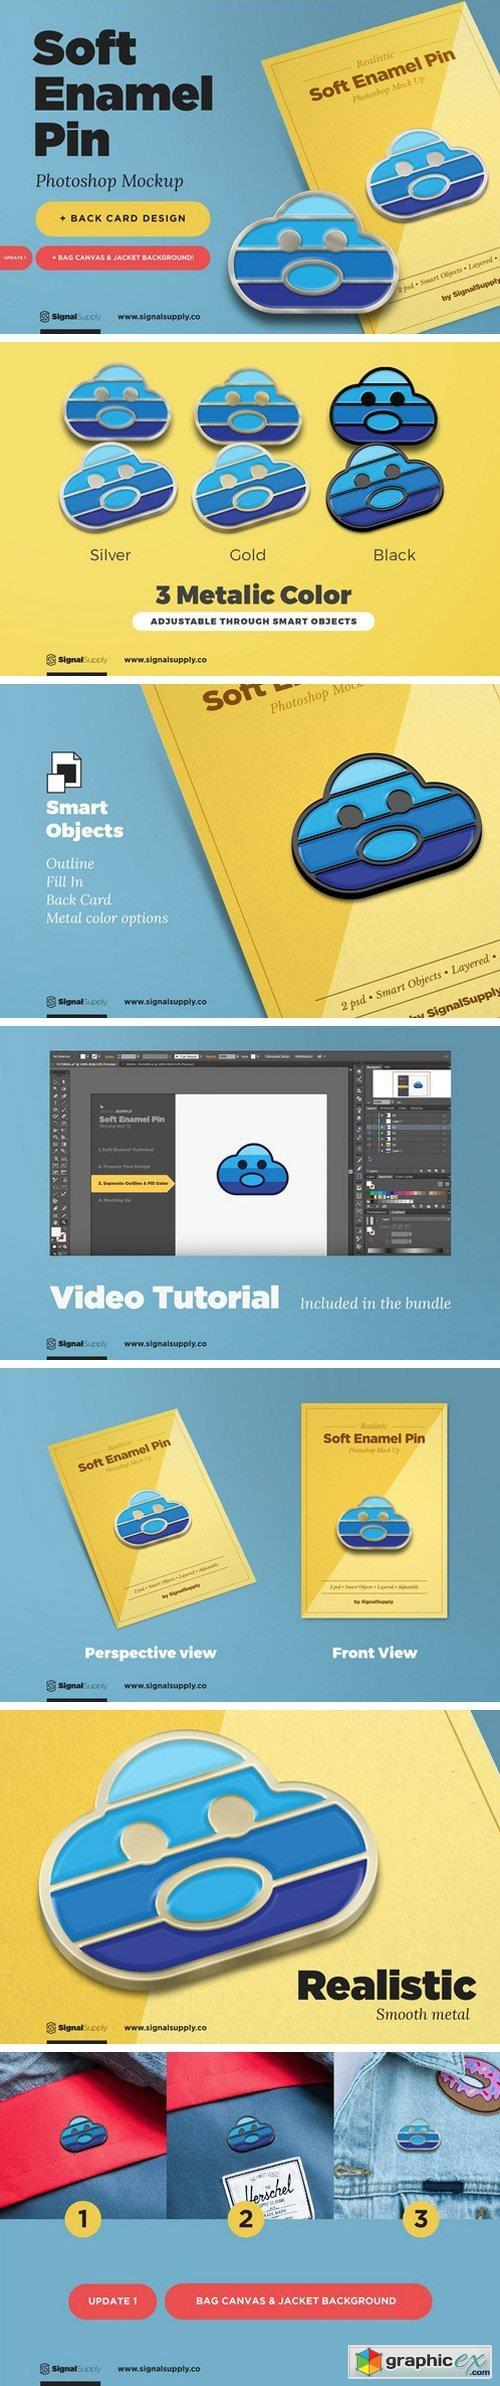 Soft Enamel Pin Mockup » Free Download Vector Stock Image Photoshop Icon